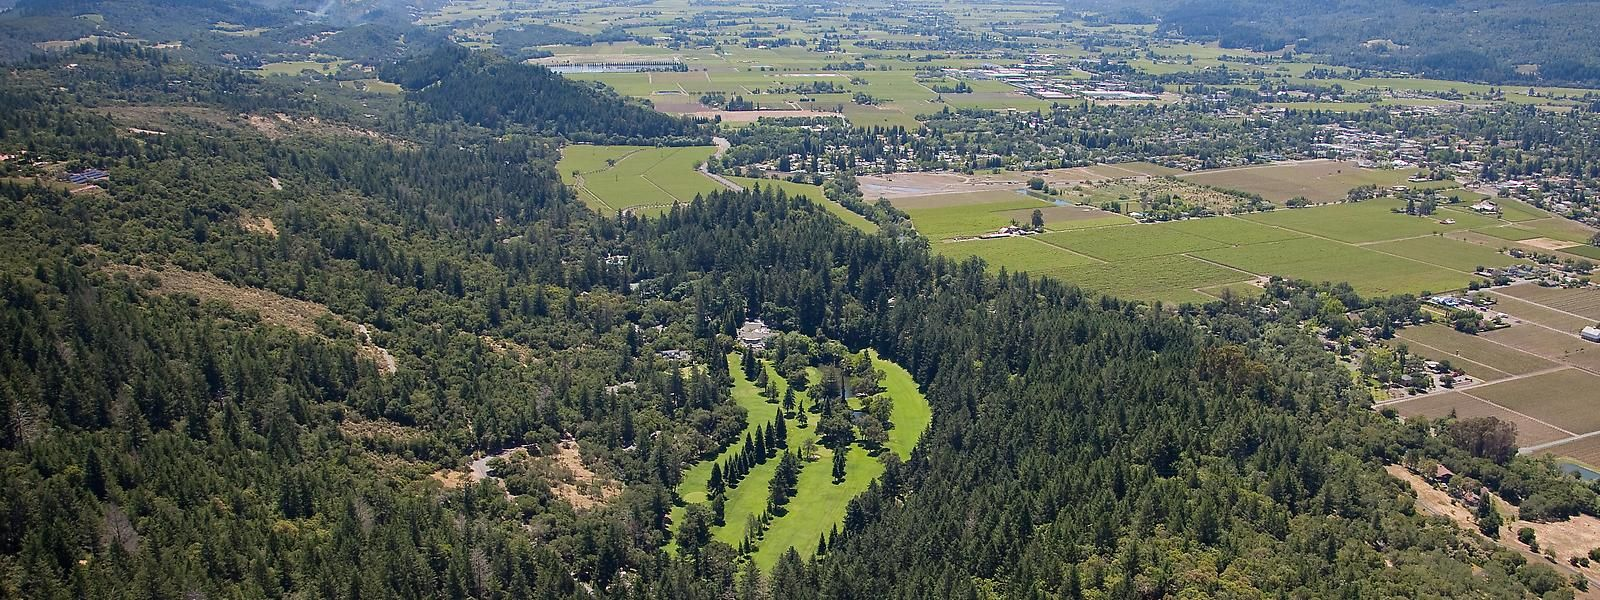 Meadowood - Napa Valley Luxury Resort and Spa - Napa Luxury Resorts